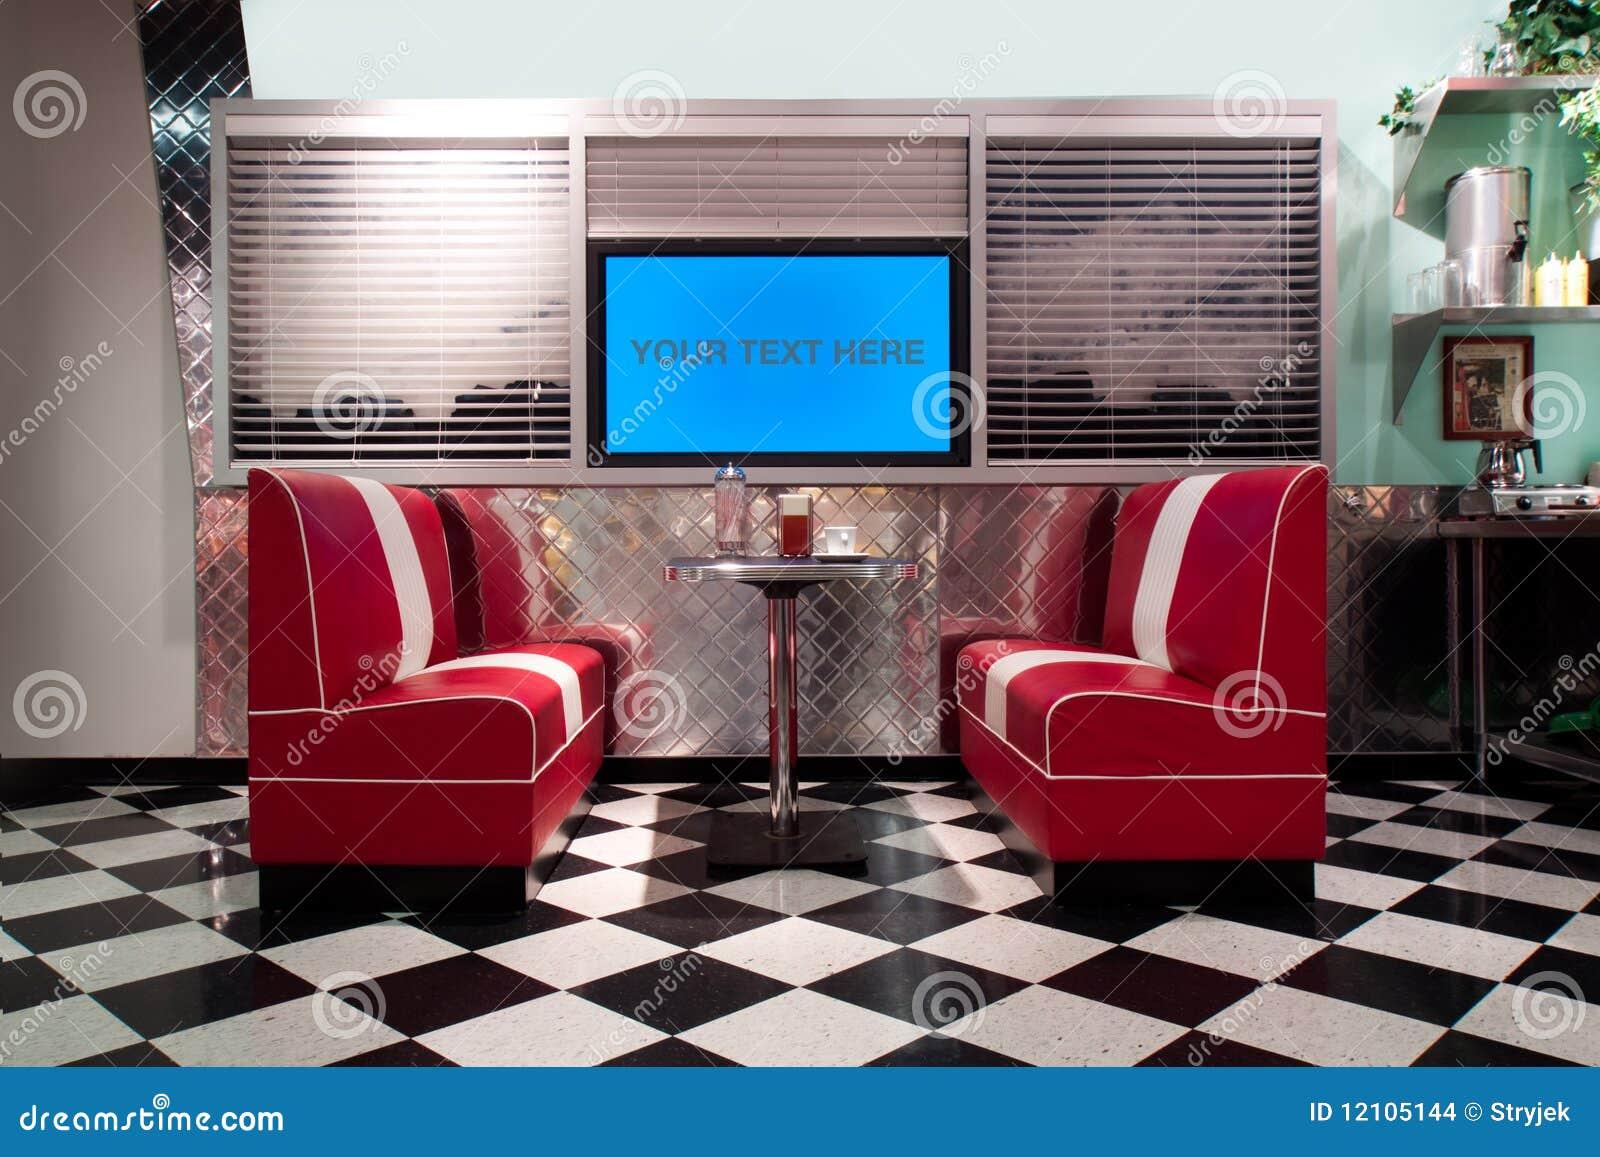 Retro style interior stock photo image of barstool deco